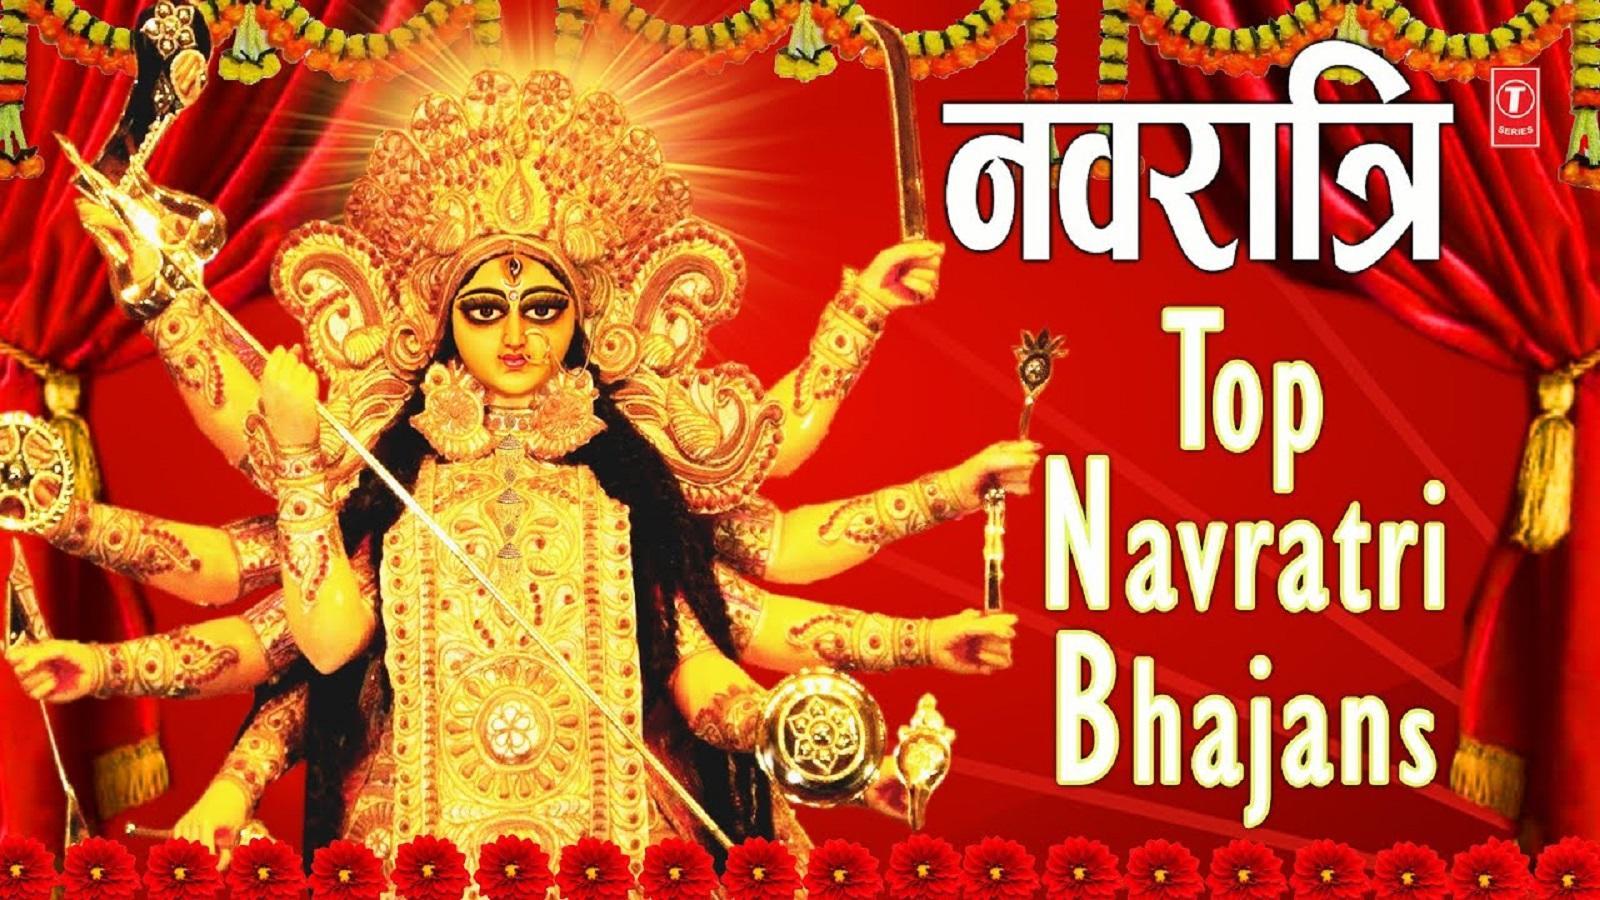 Sonu Nigam Top Navratri Bhajans Vol 7 , HD Wallpaper & Backgrounds